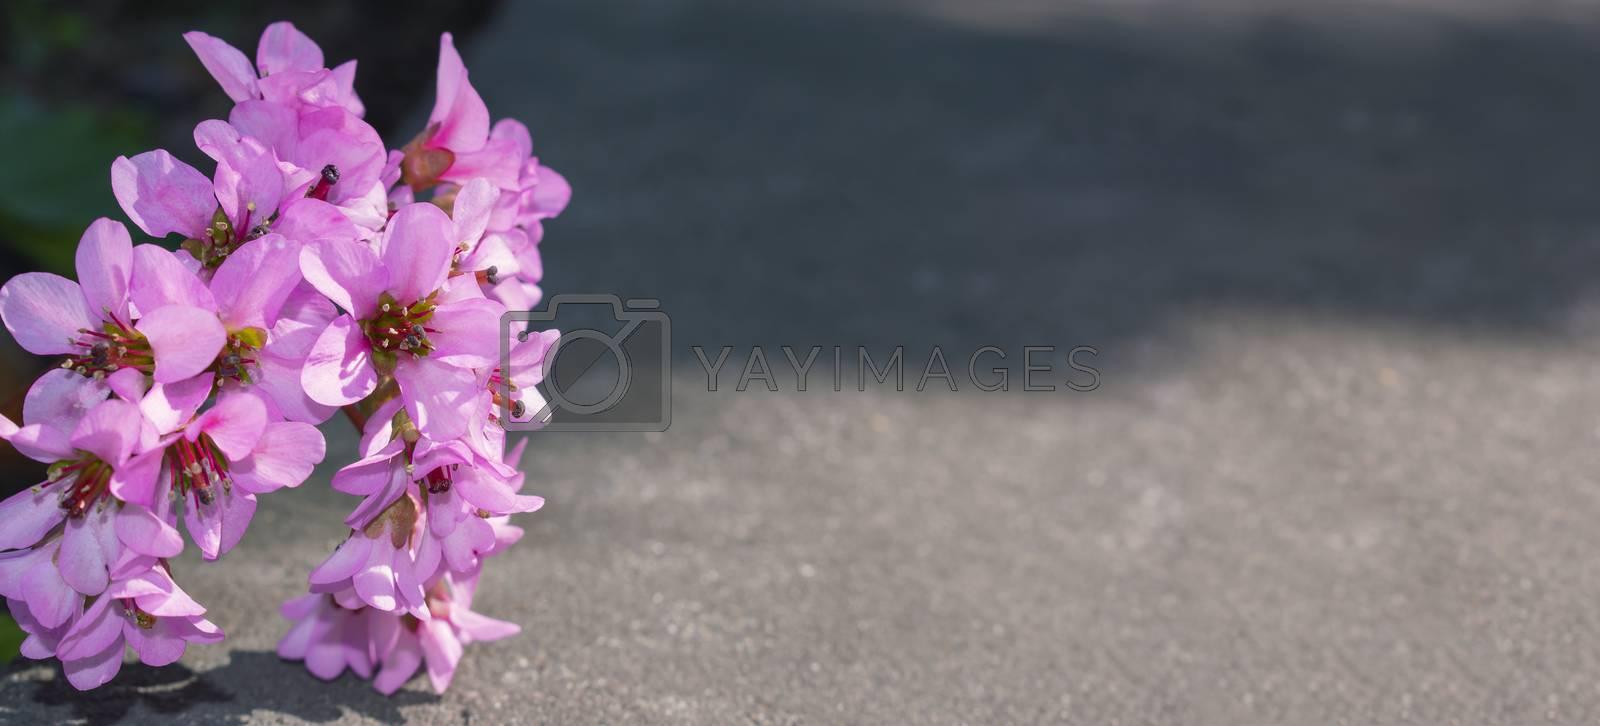 Elegant floral background. Pink flower over concrete. Bergenia crassifolia at spring.